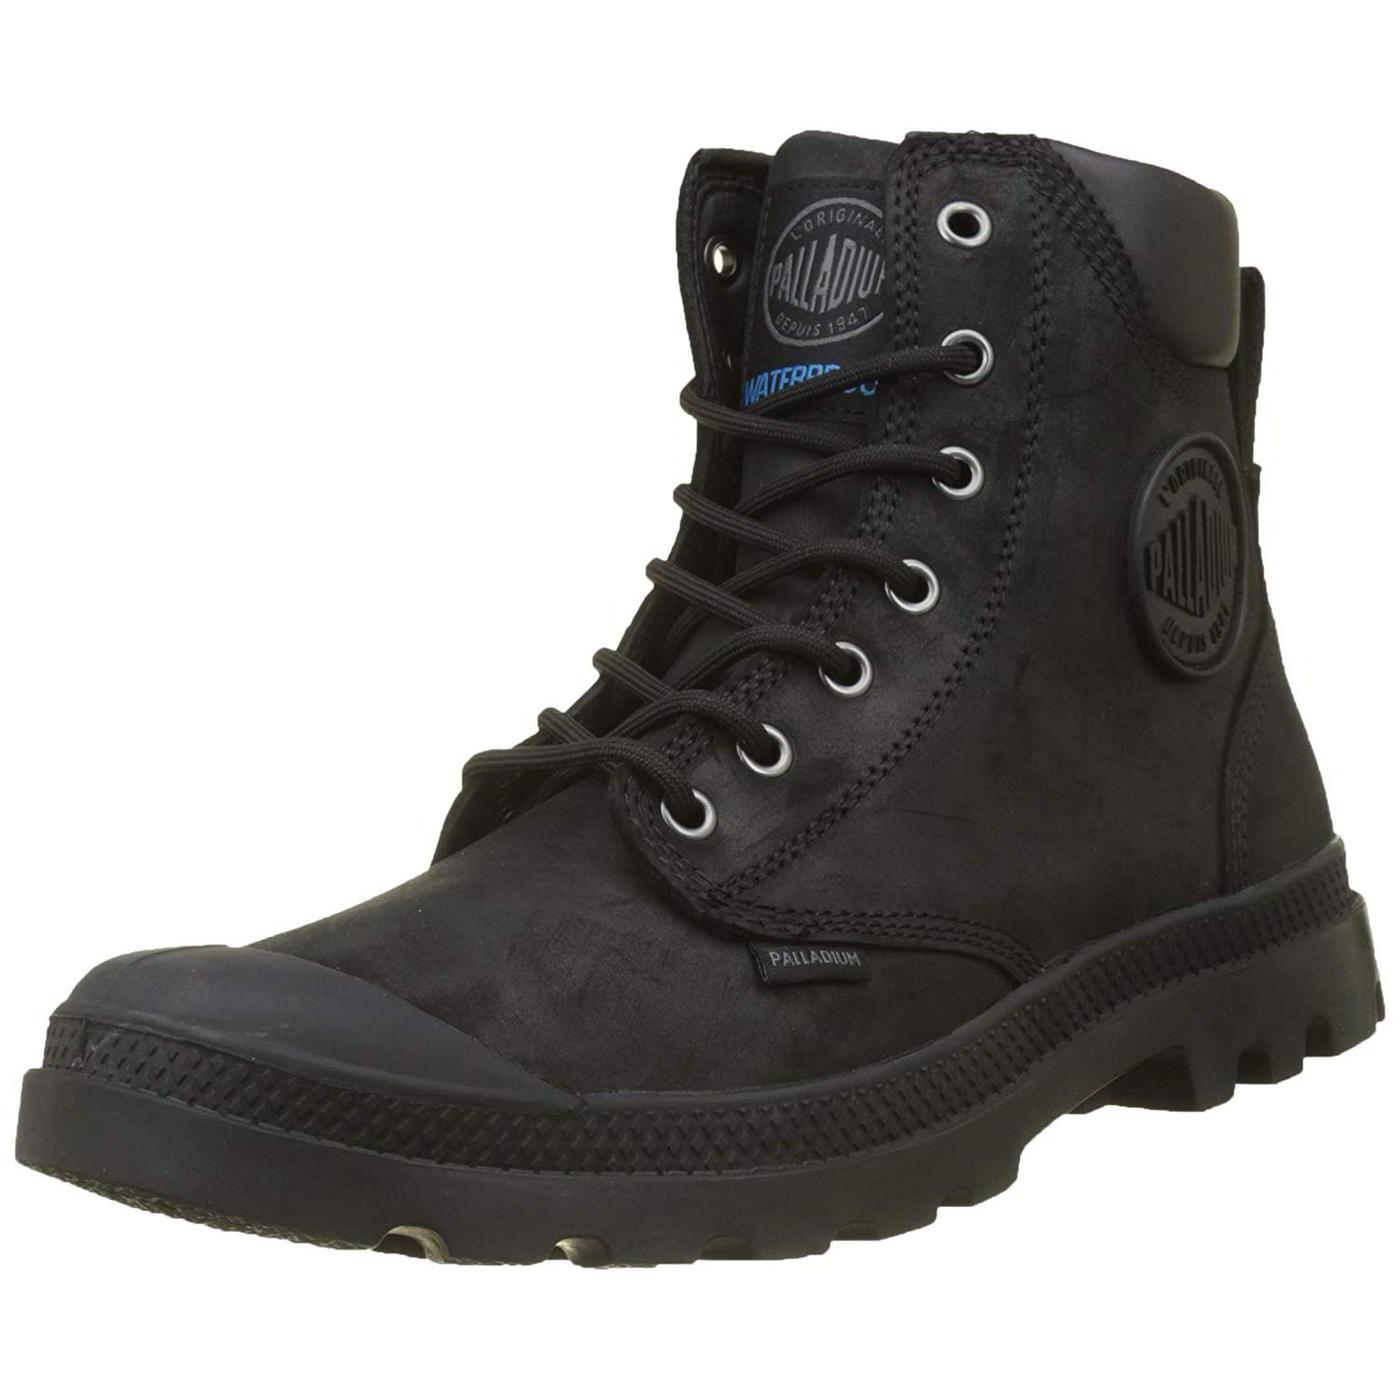 Palladium Pampa Hi Cuff WP Mens Waterproof Lux Combat Ankle Boots Size 8-11